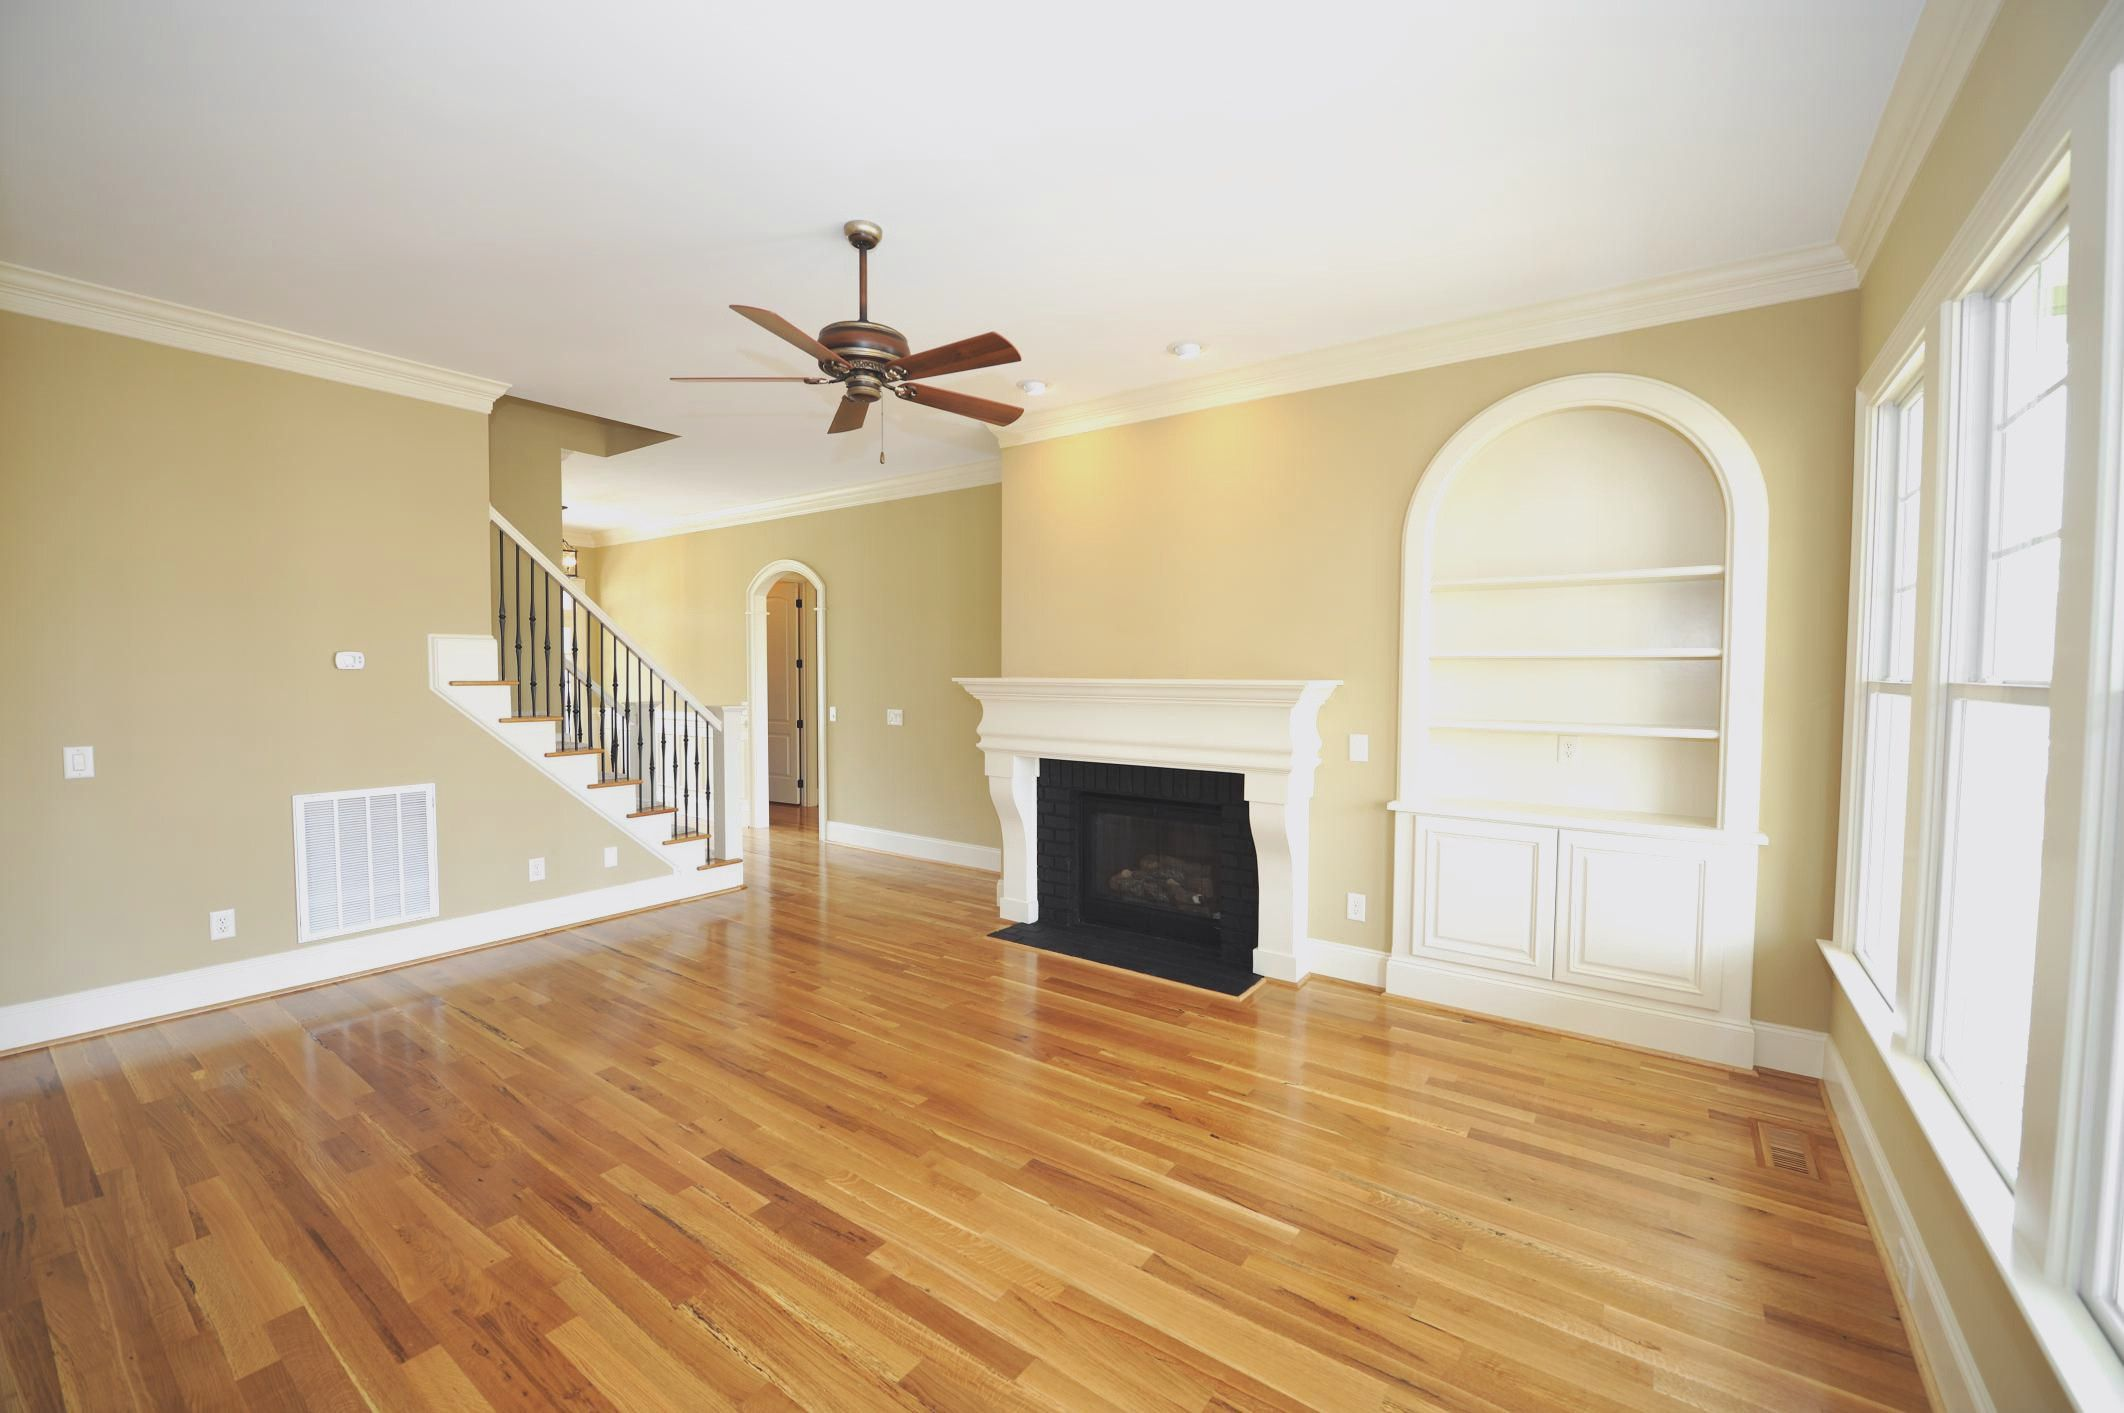 14 Unfinished Hardwood Flooring Prices